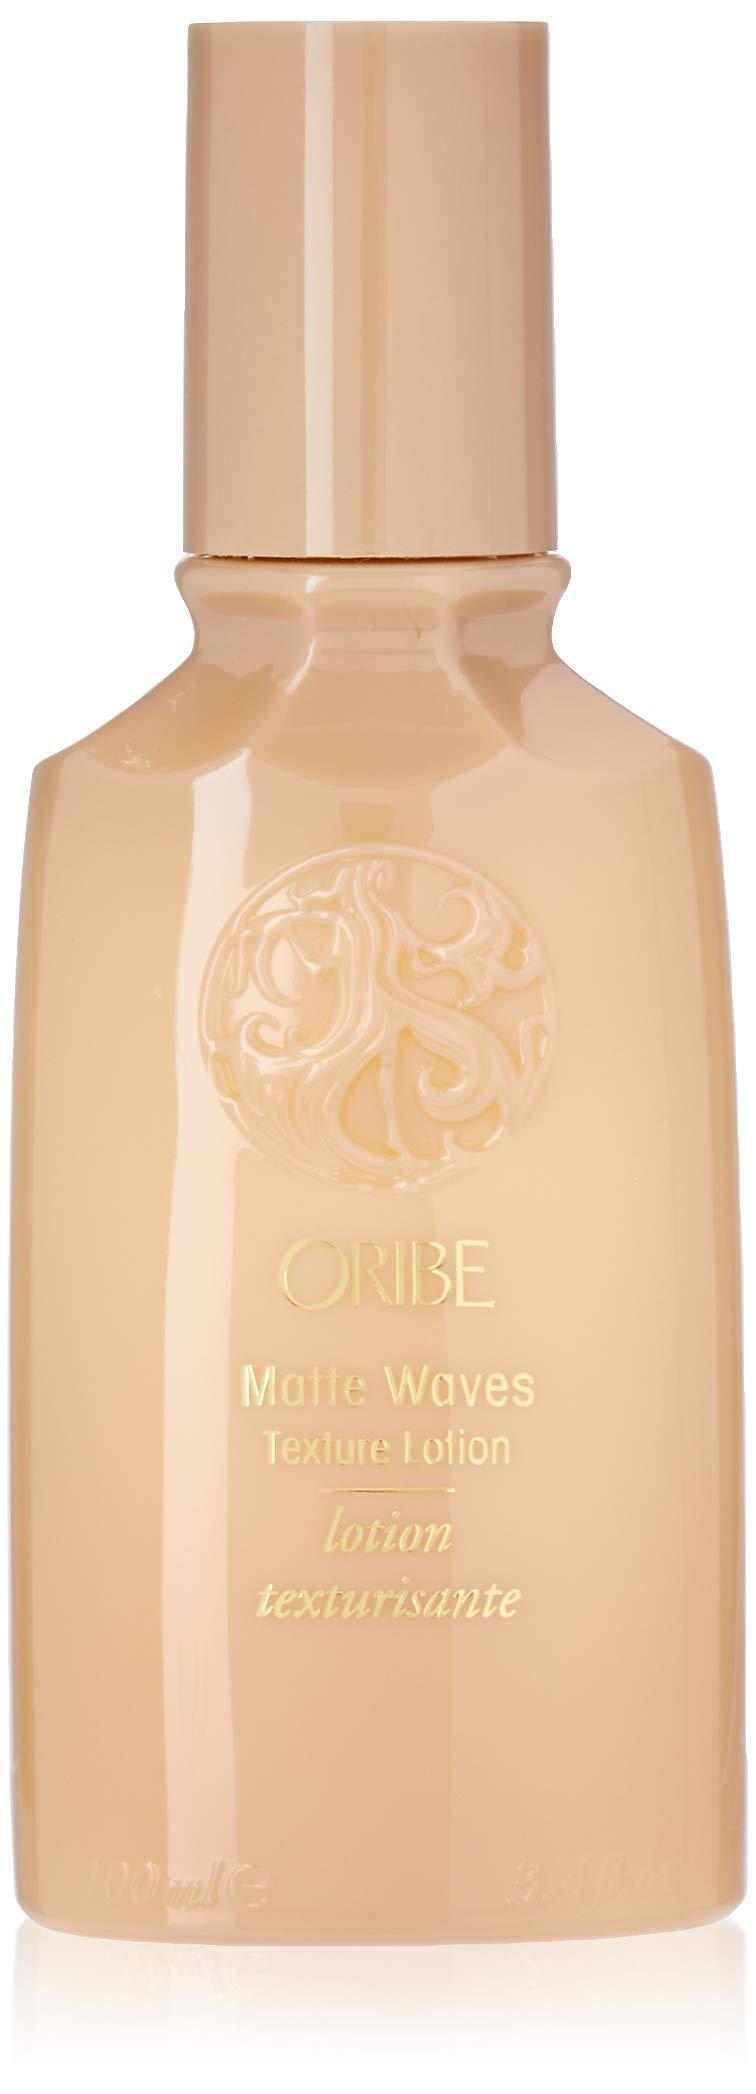 ORIBE Matte Waves Texture Lotion, 3.4 Fl oz by ORIBE